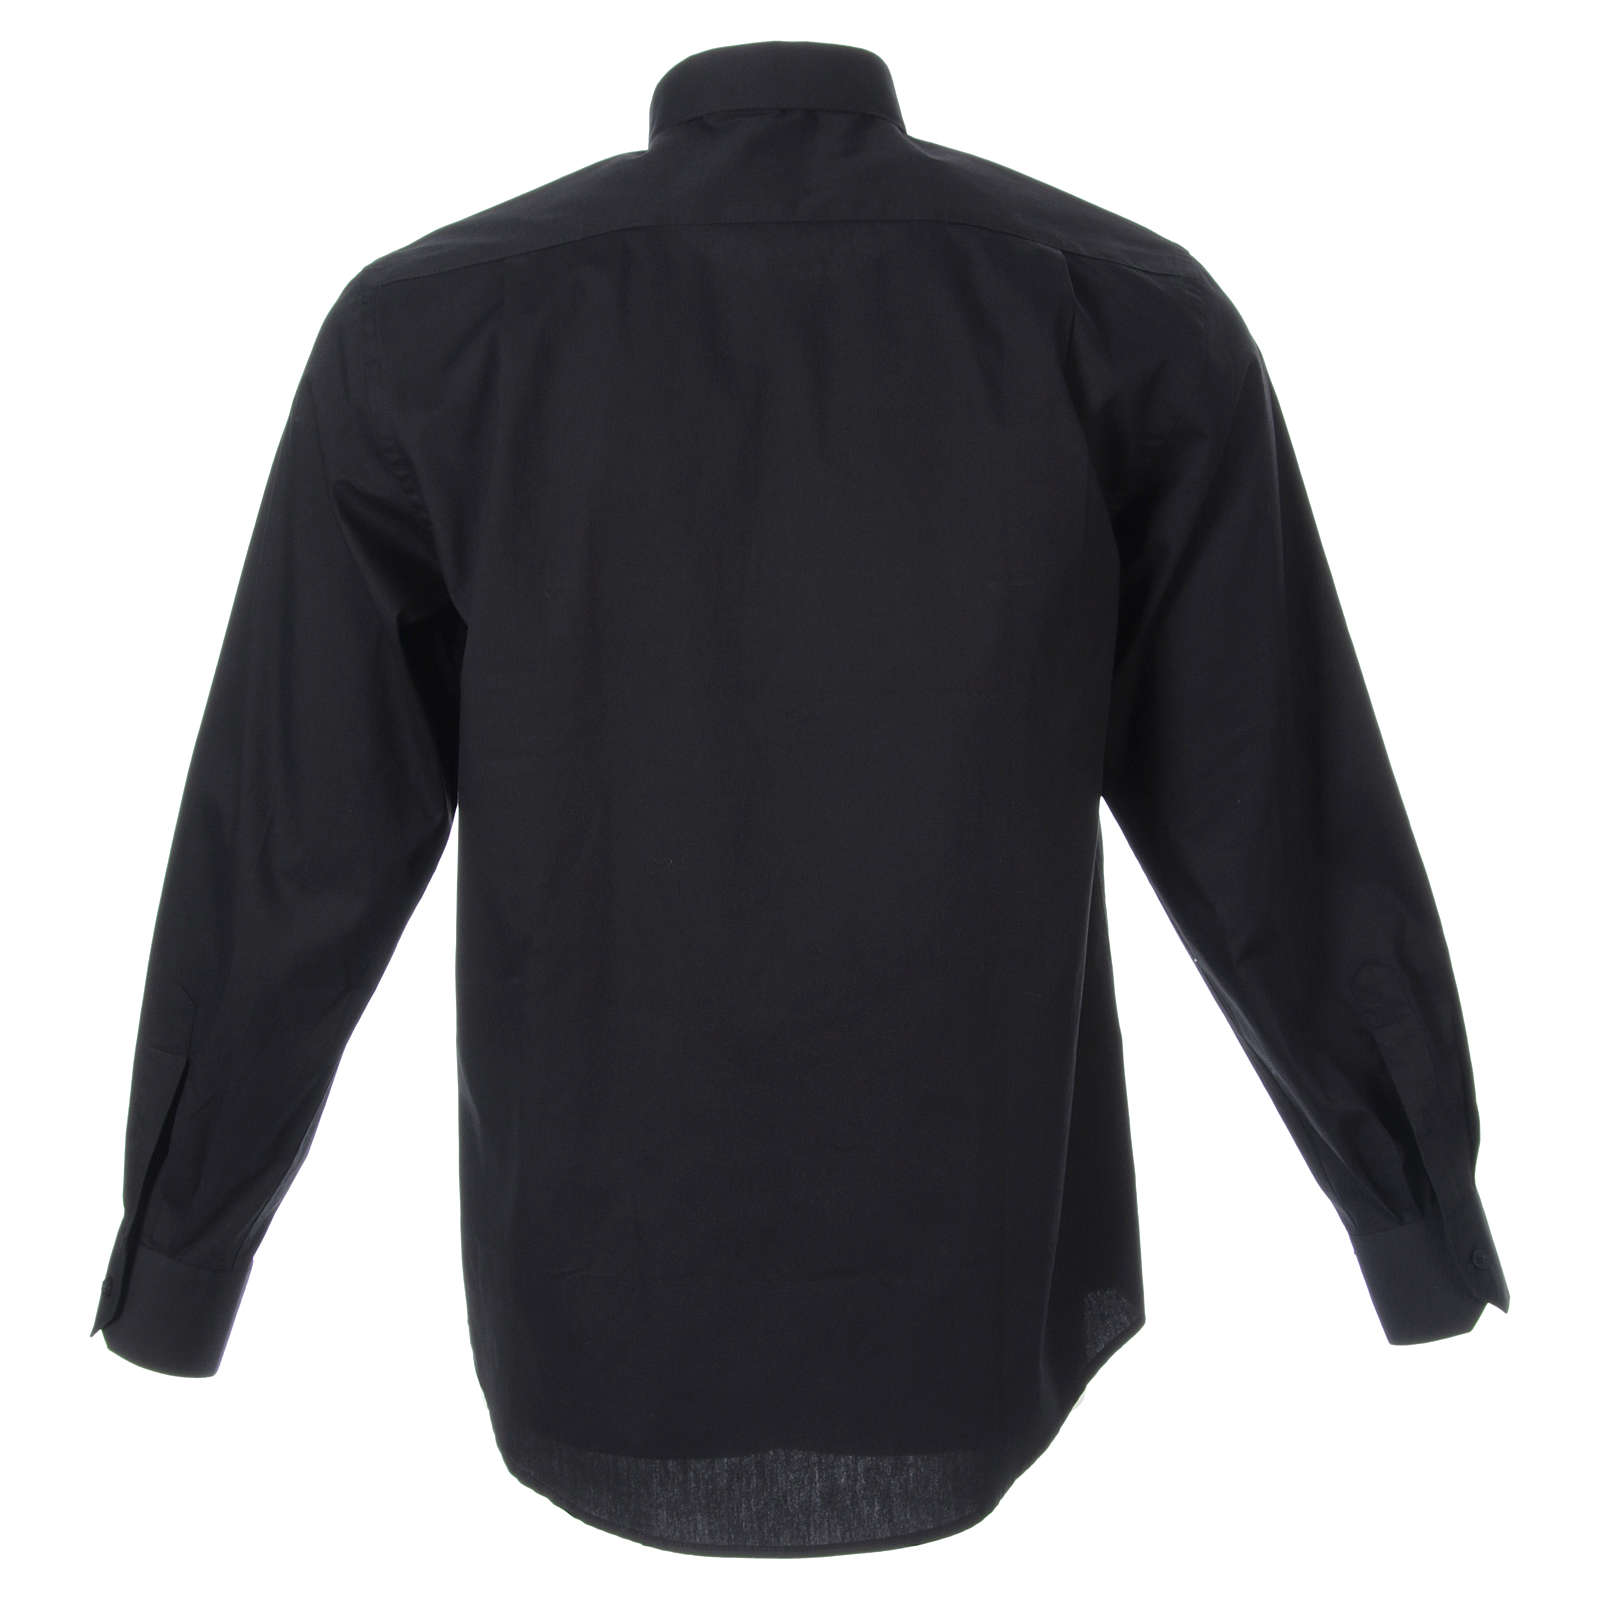 STOCK Clergyman shirt, long sleeves in black popeline 4